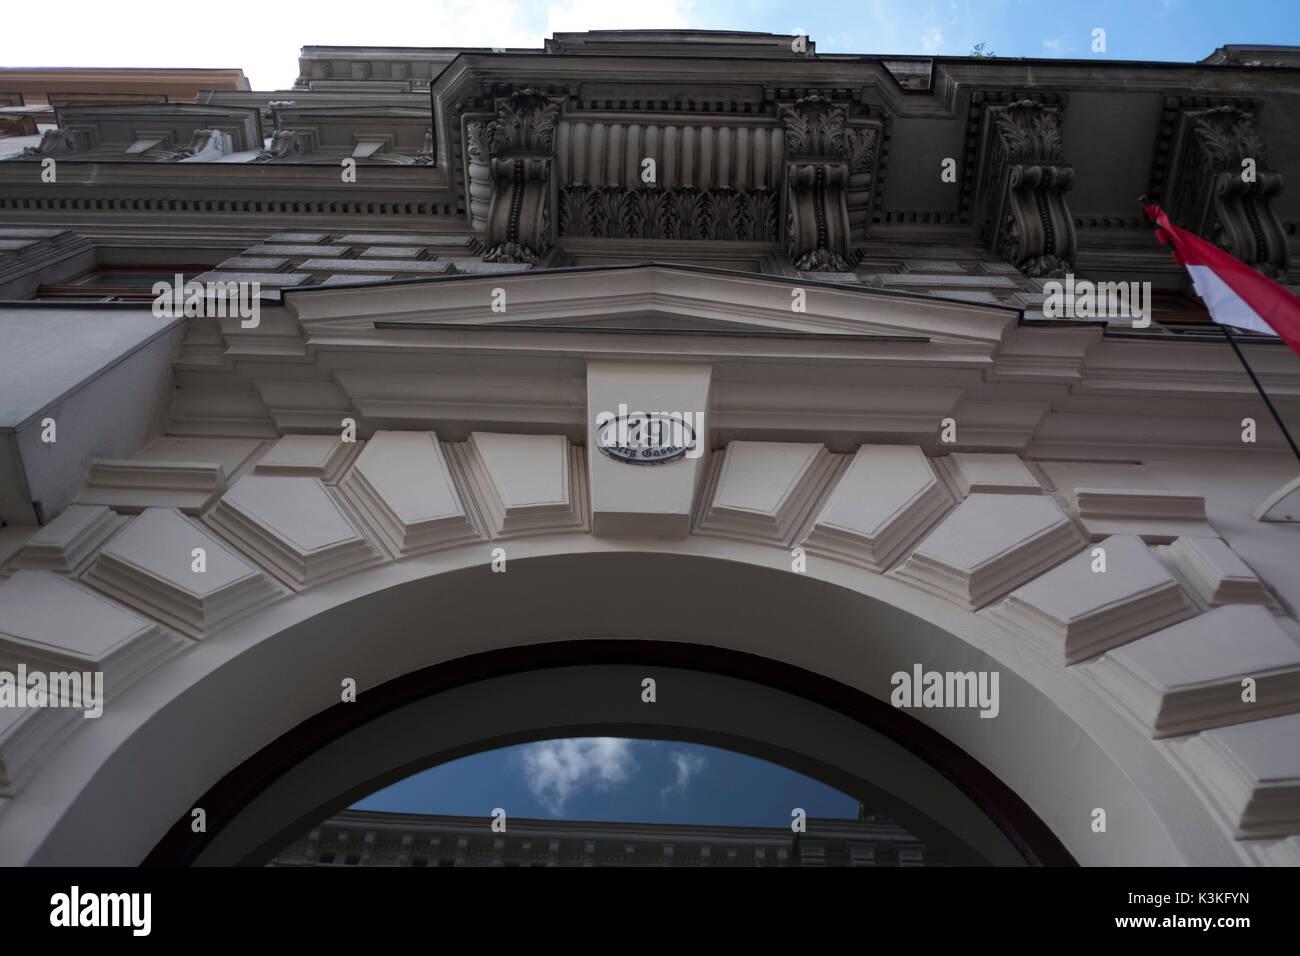 Europe, Austria, Vienna, capital, Sigmund Freud Museum, facade, detail - Stock Image